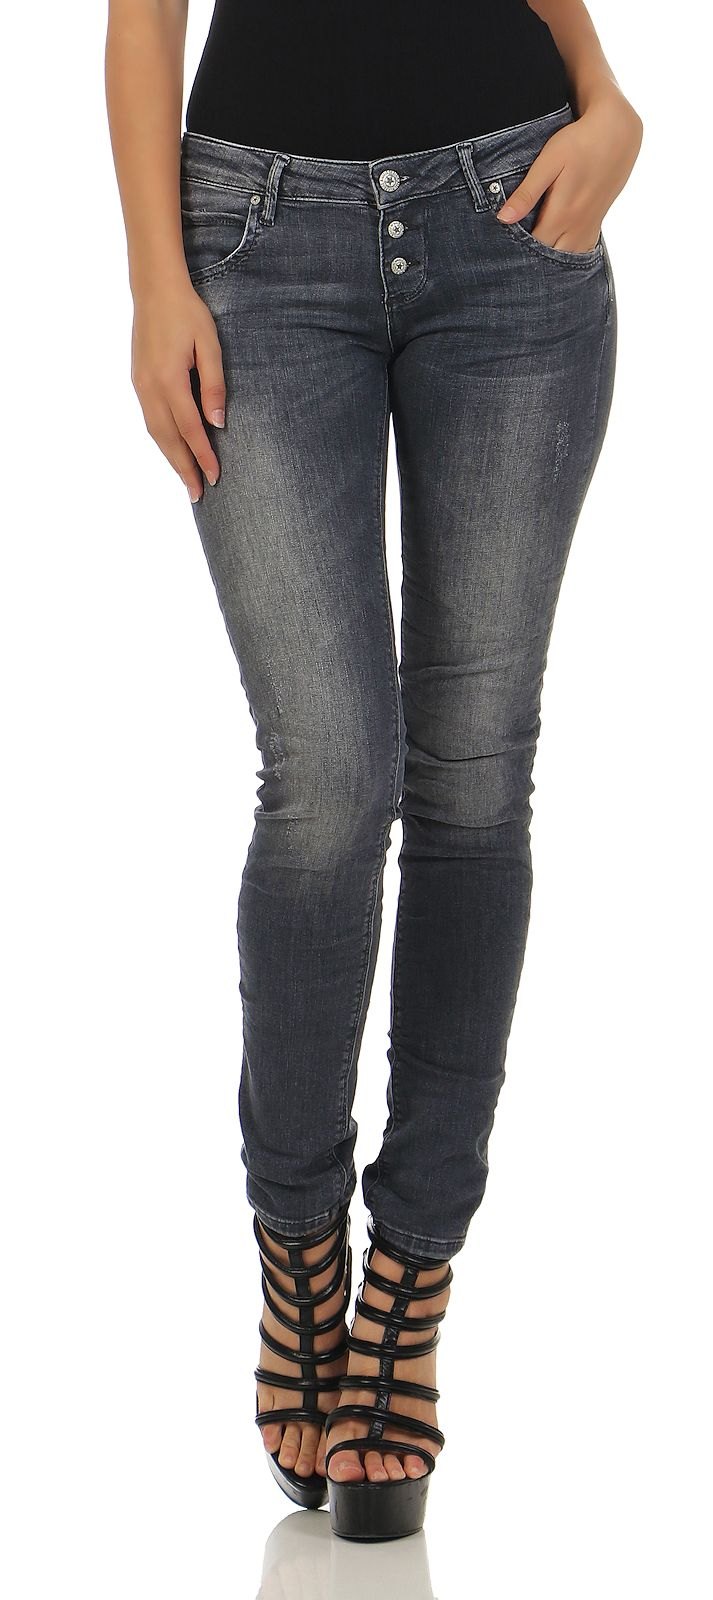 37b24590520b M.O.D Damen Jeans Ulla Slim mallorca grey skinny destroyed Pants ...